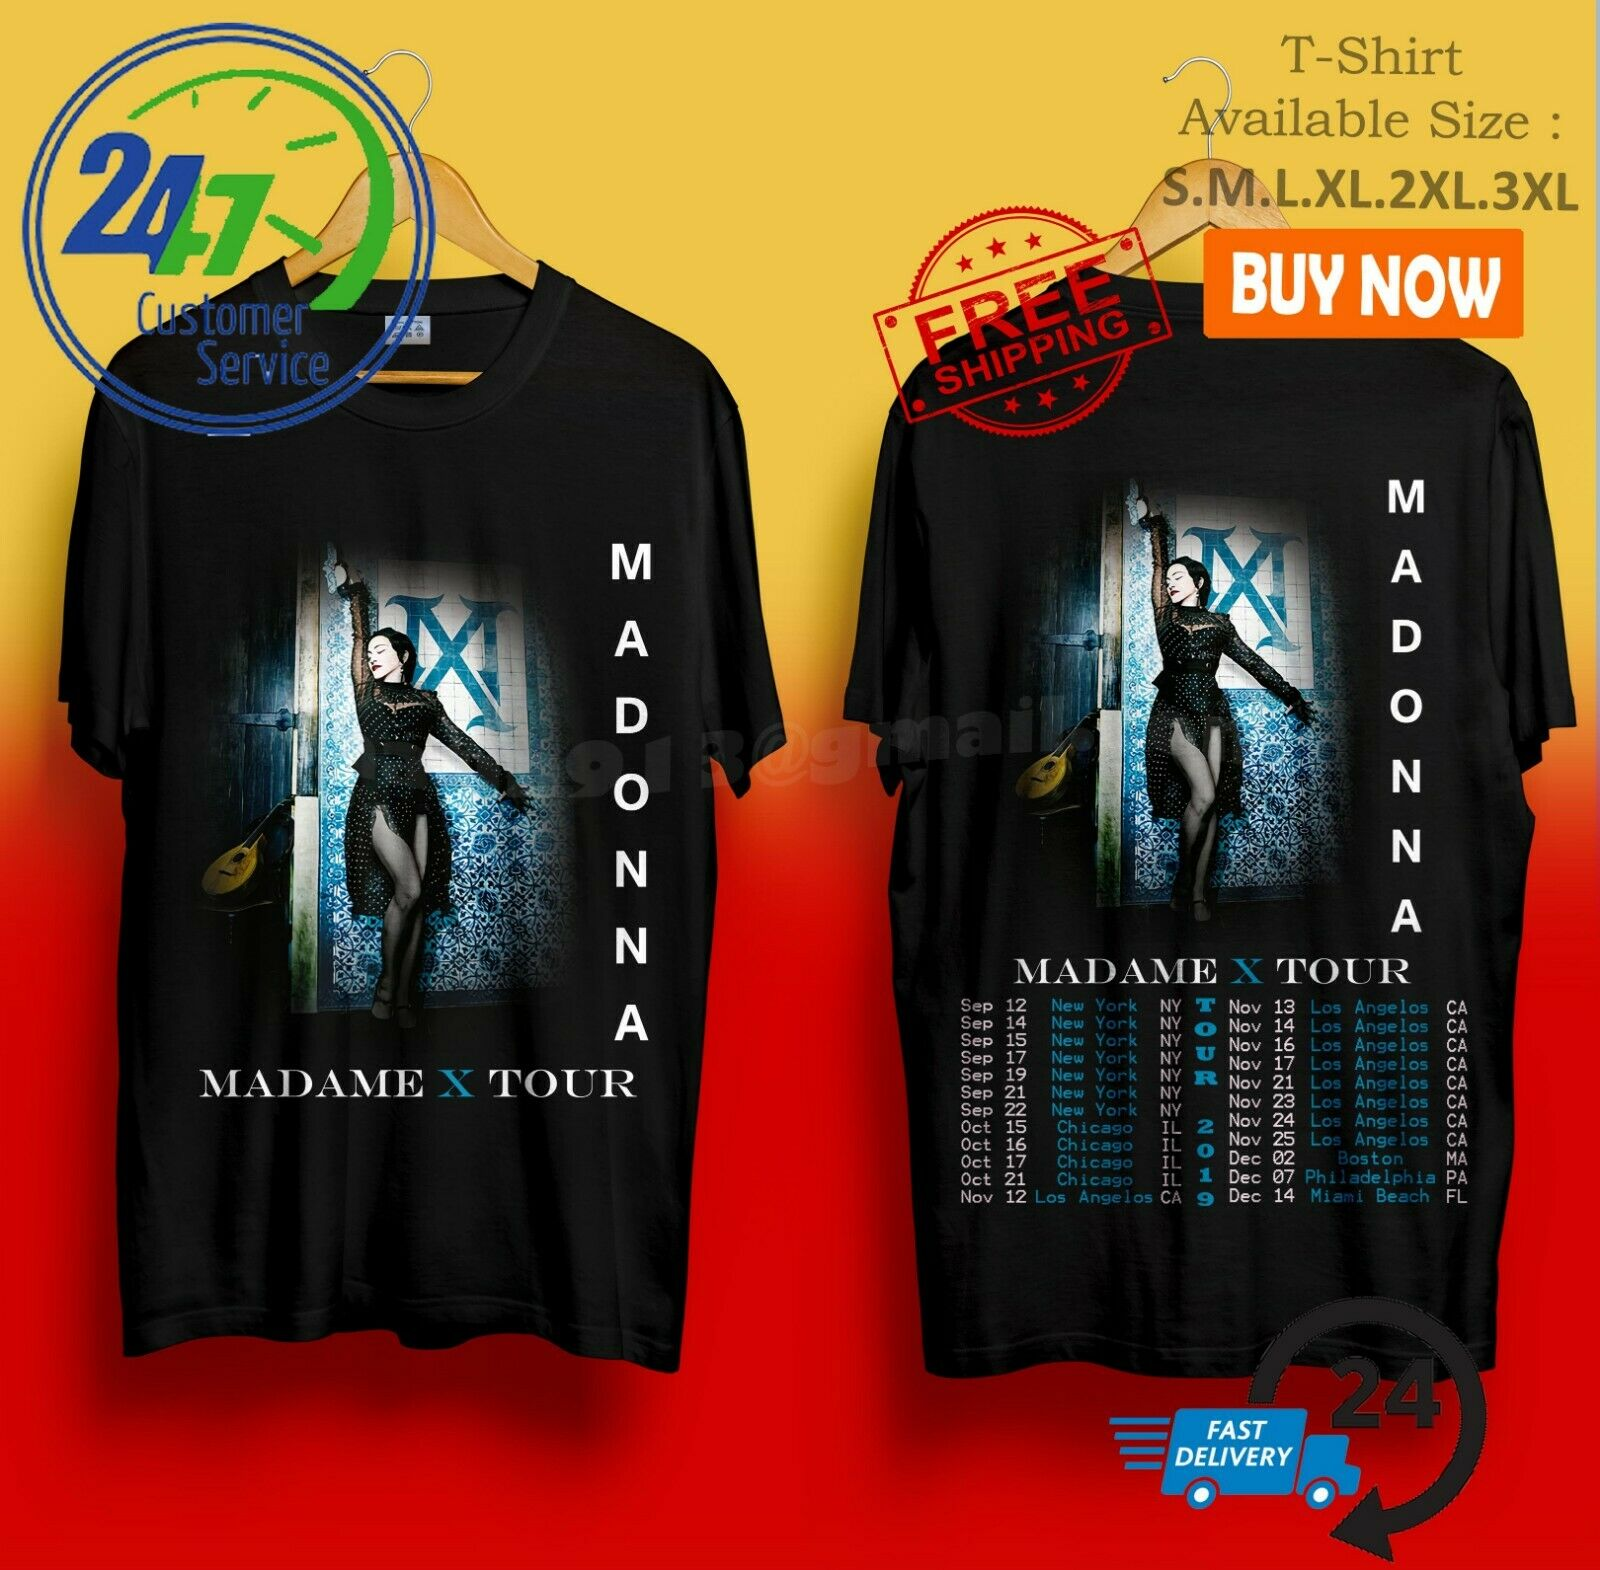 Madonna Madame X Tour 2019 U.S.A Trend Black Tshirt Size S-3Xl